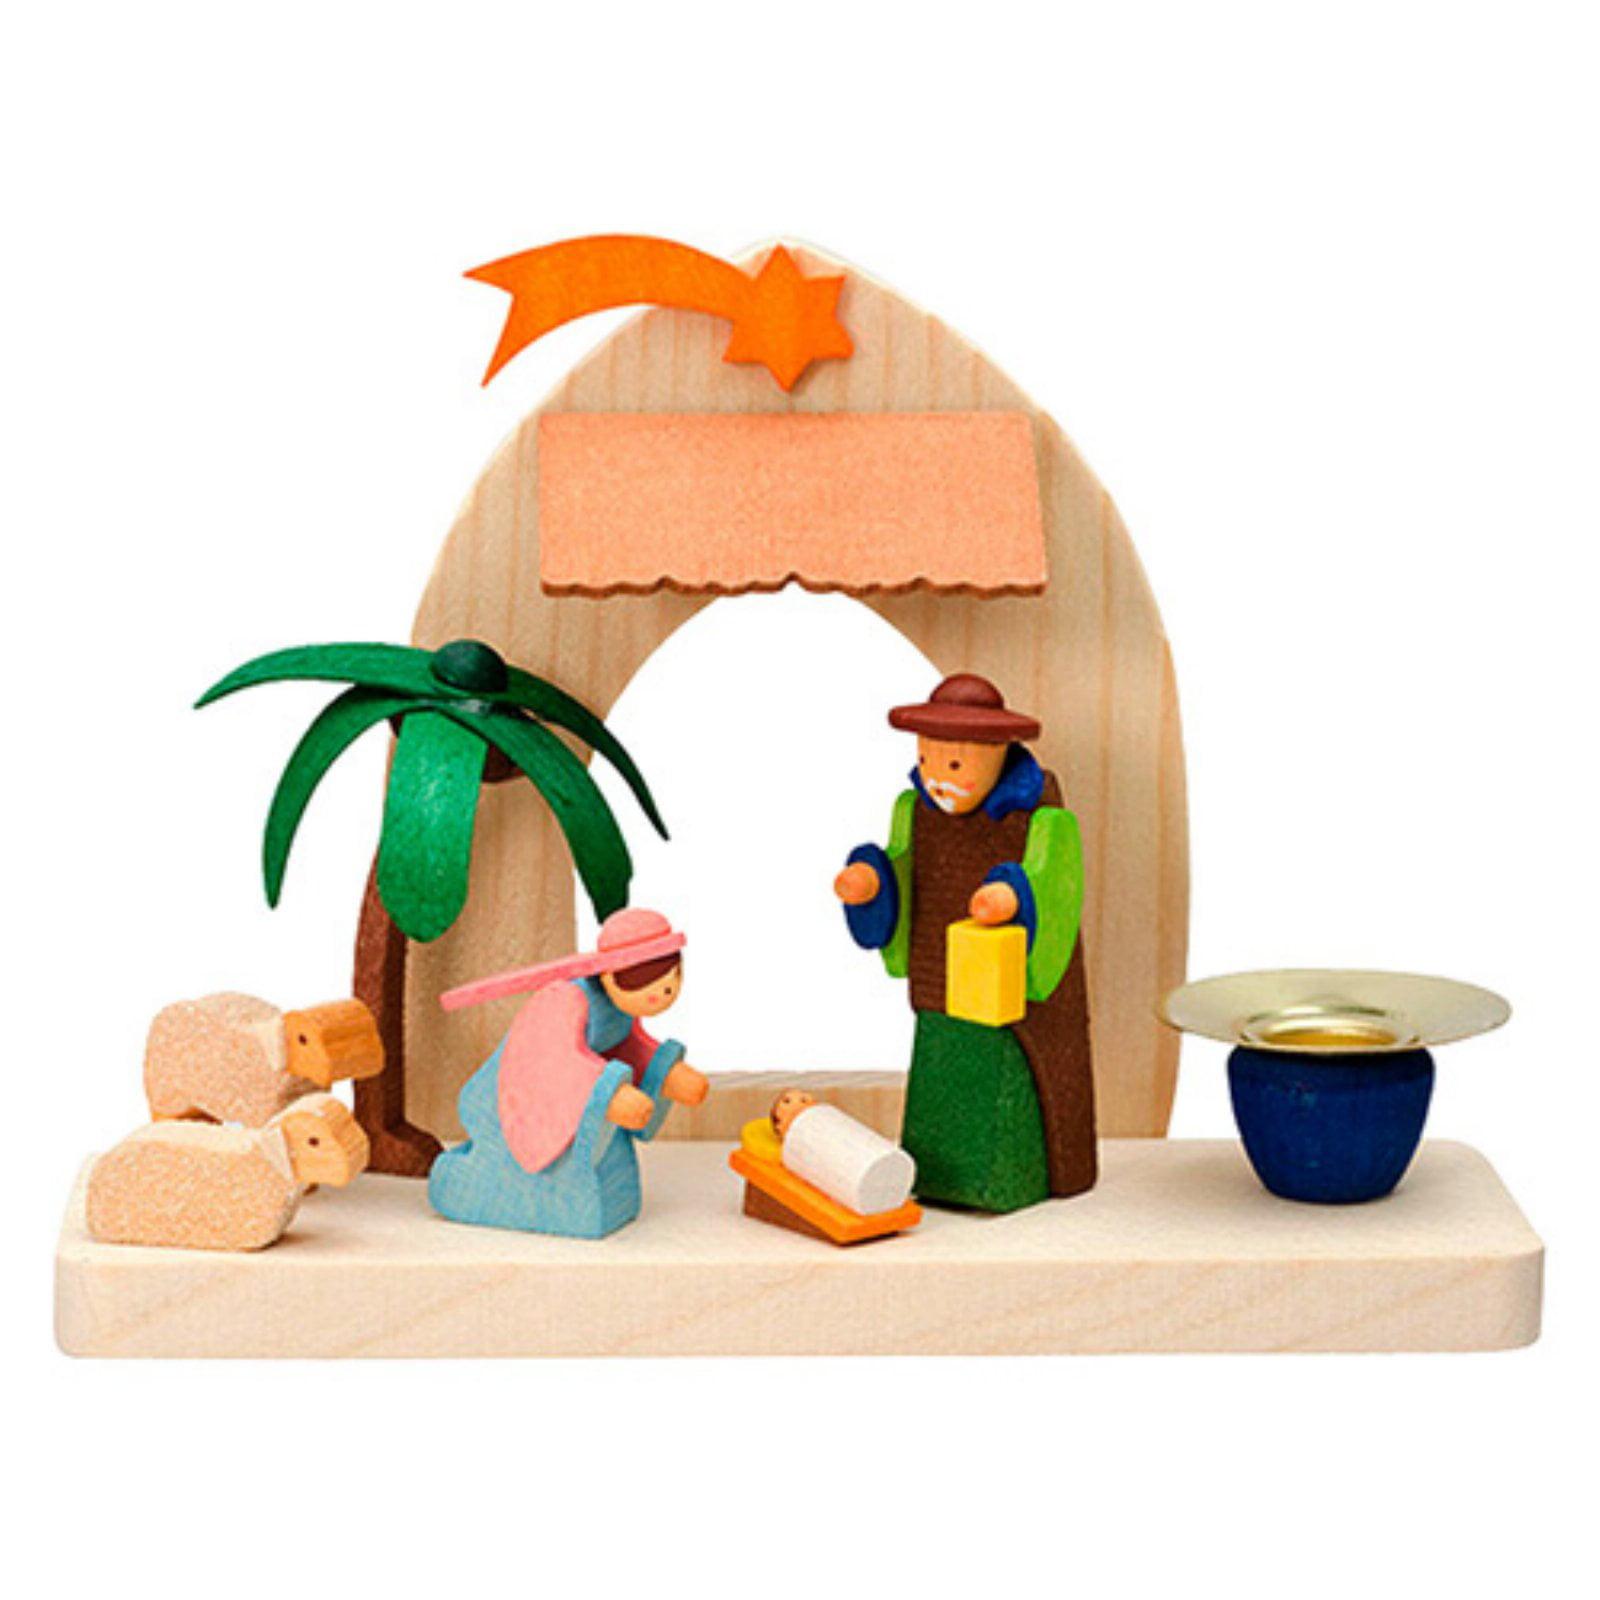 Graupner 3.25 in. Nativity Scene with Santa Candle Holder